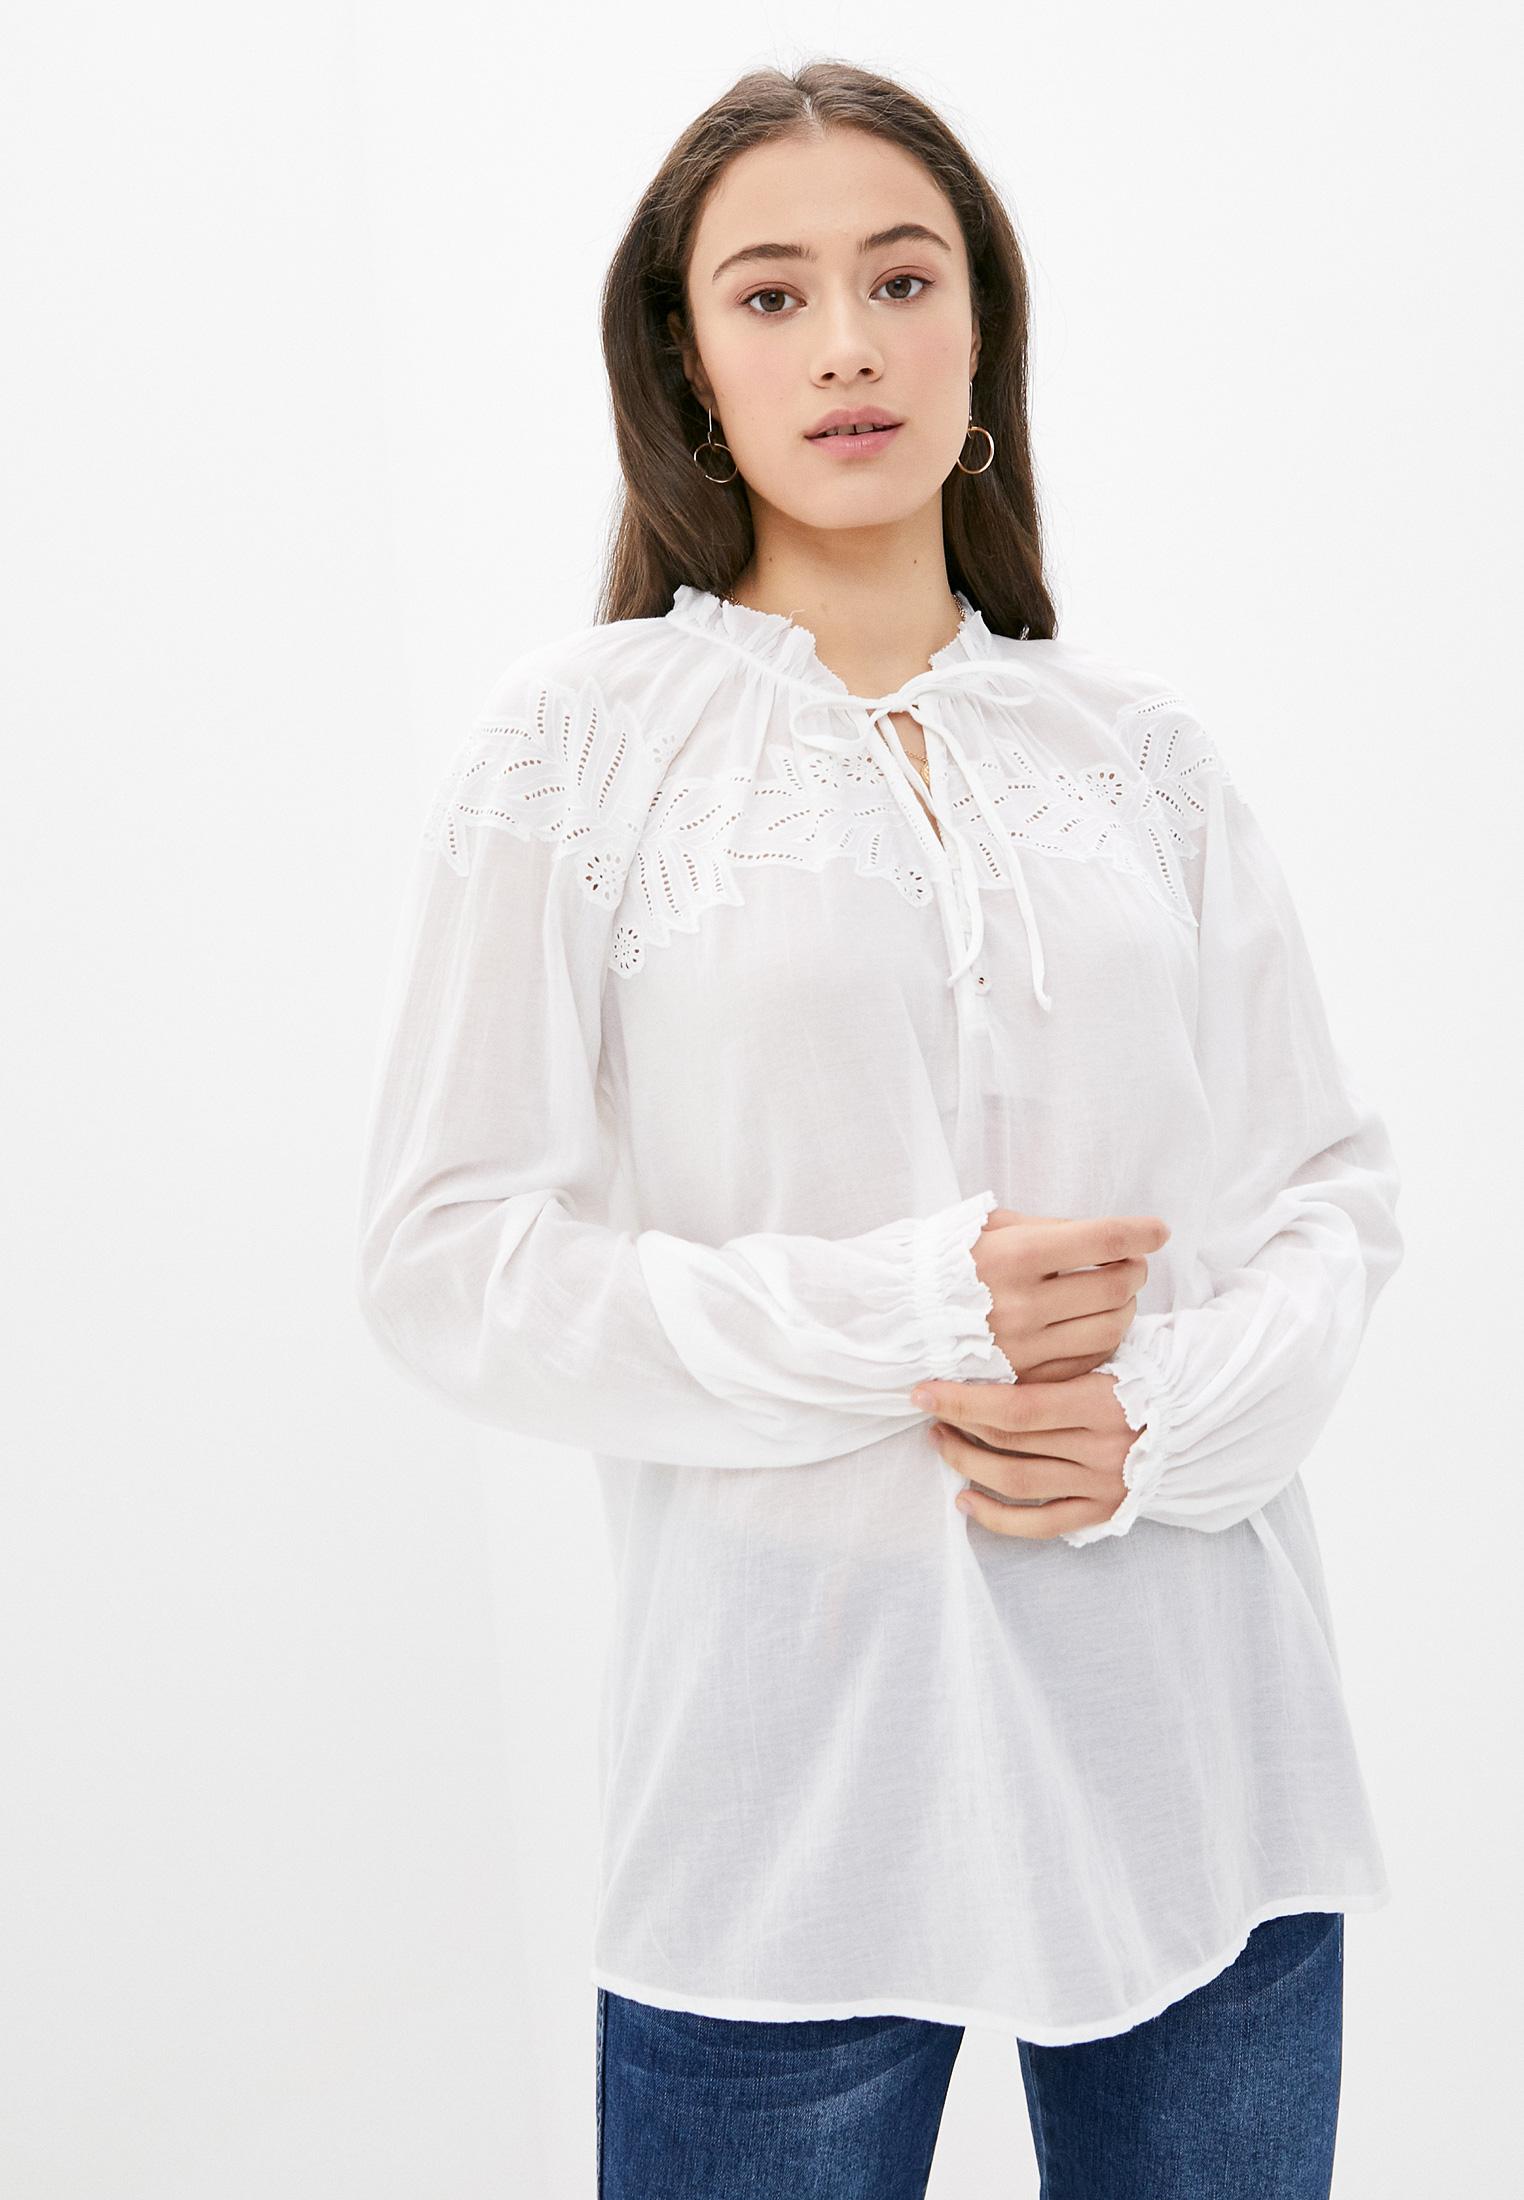 Блуза Tommy Hilfiger (Томми Хилфигер) WW0WW28162: изображение 1